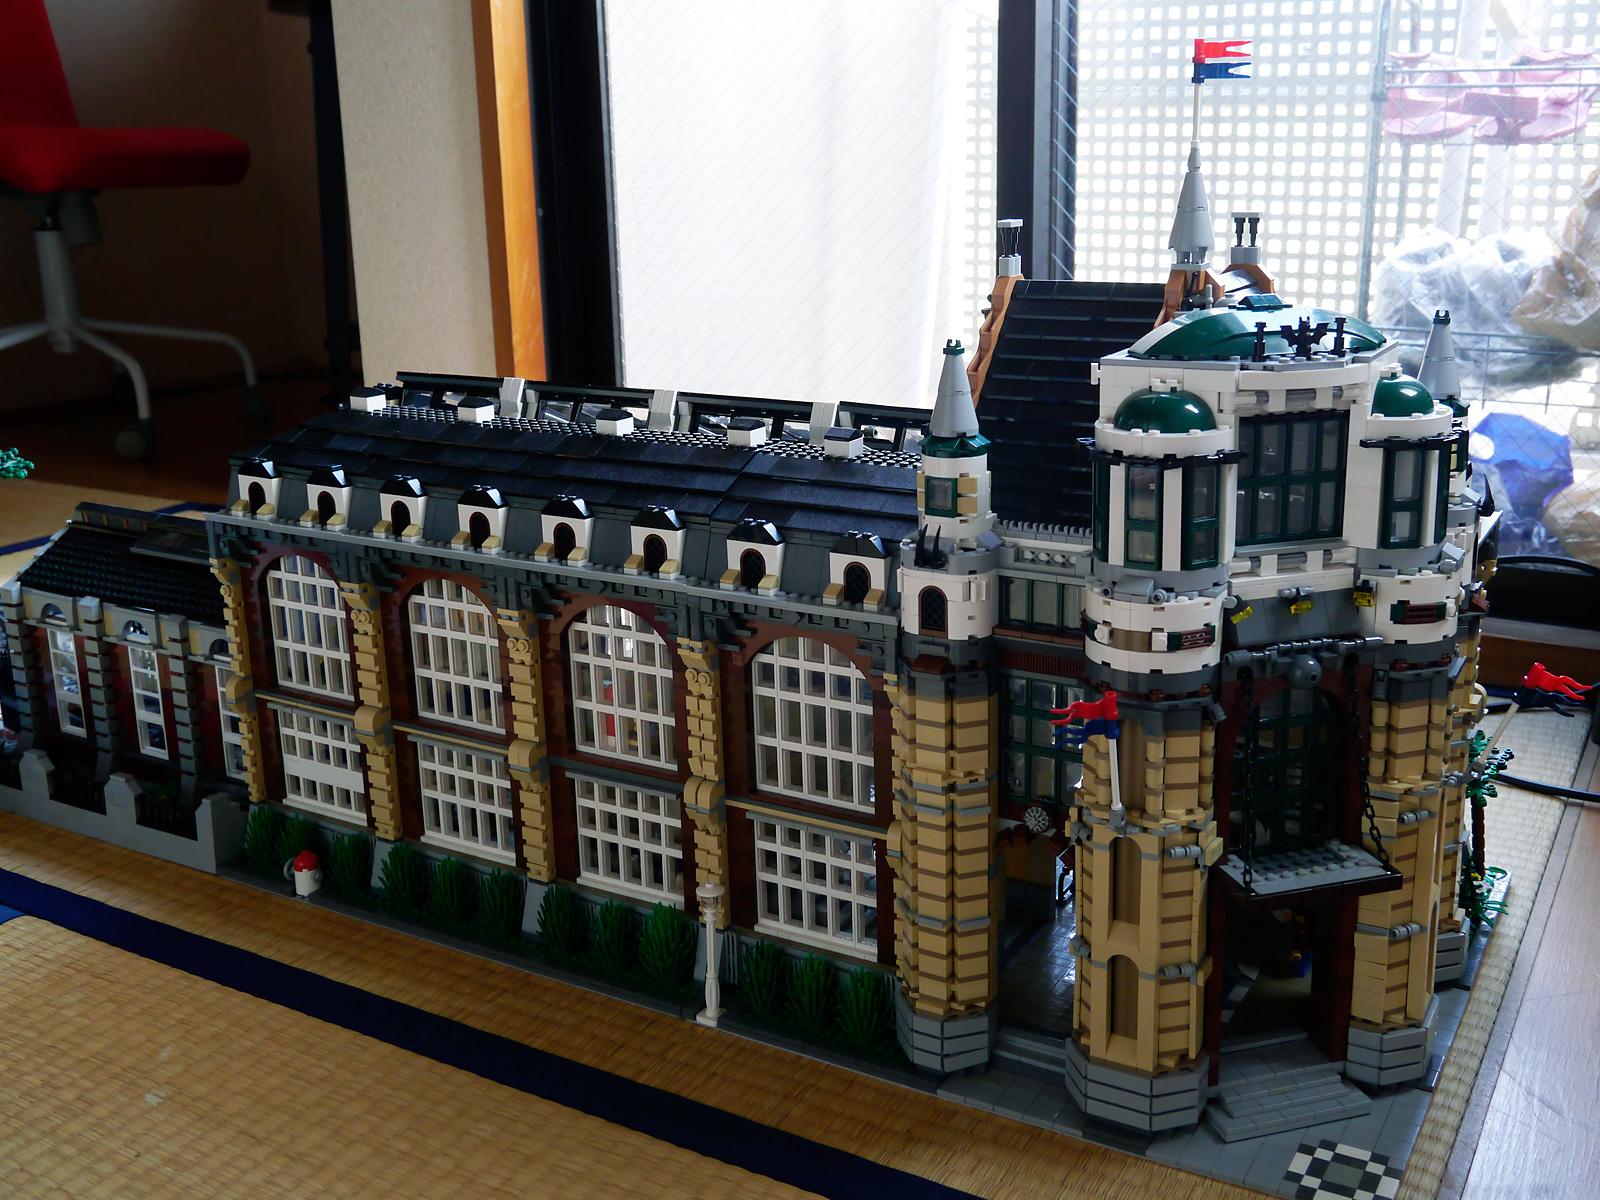 LEGO Train Station Instructions 7997, City | Building Lego City